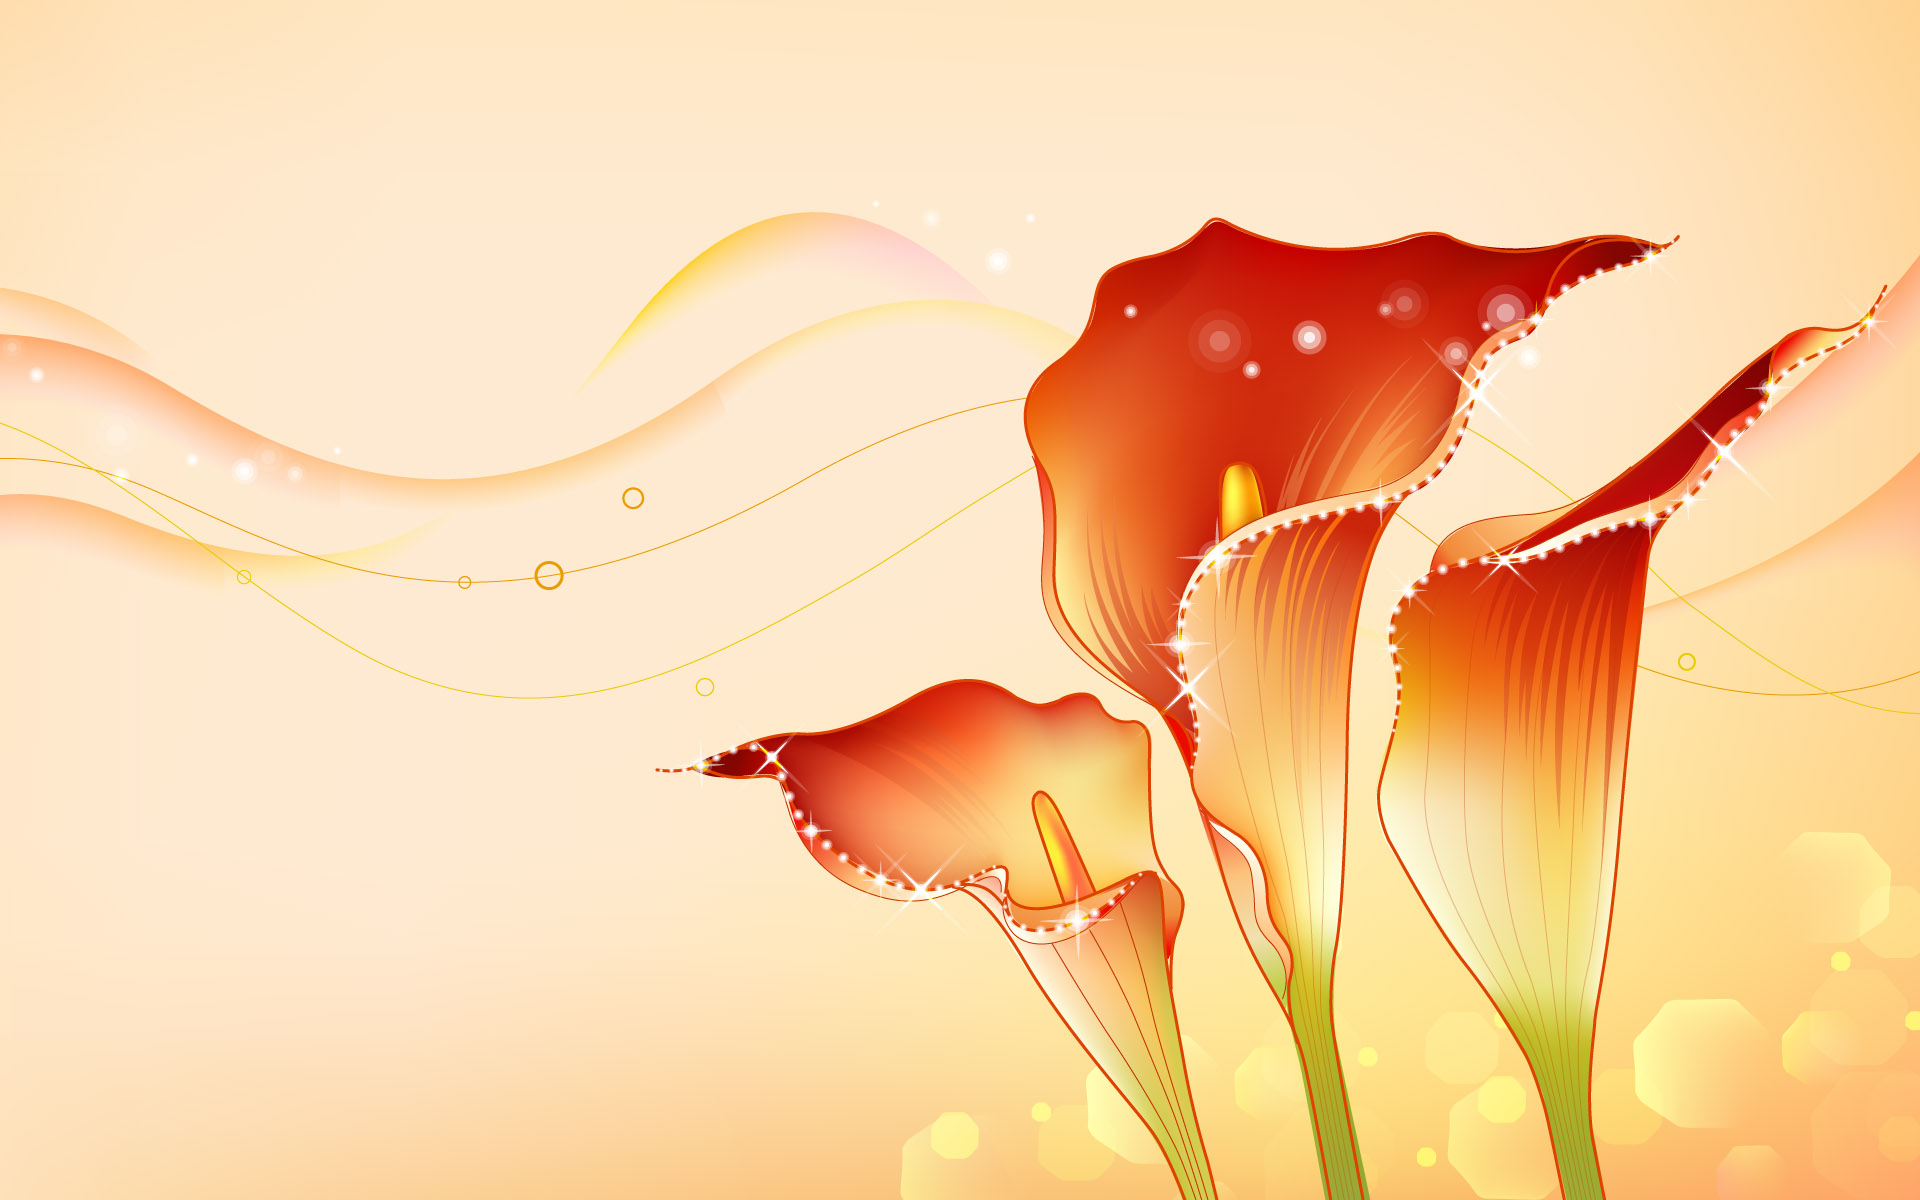 Flower Design Wallpaper 6996 Hd Wallpapers in Vector n Designs 1920x1200